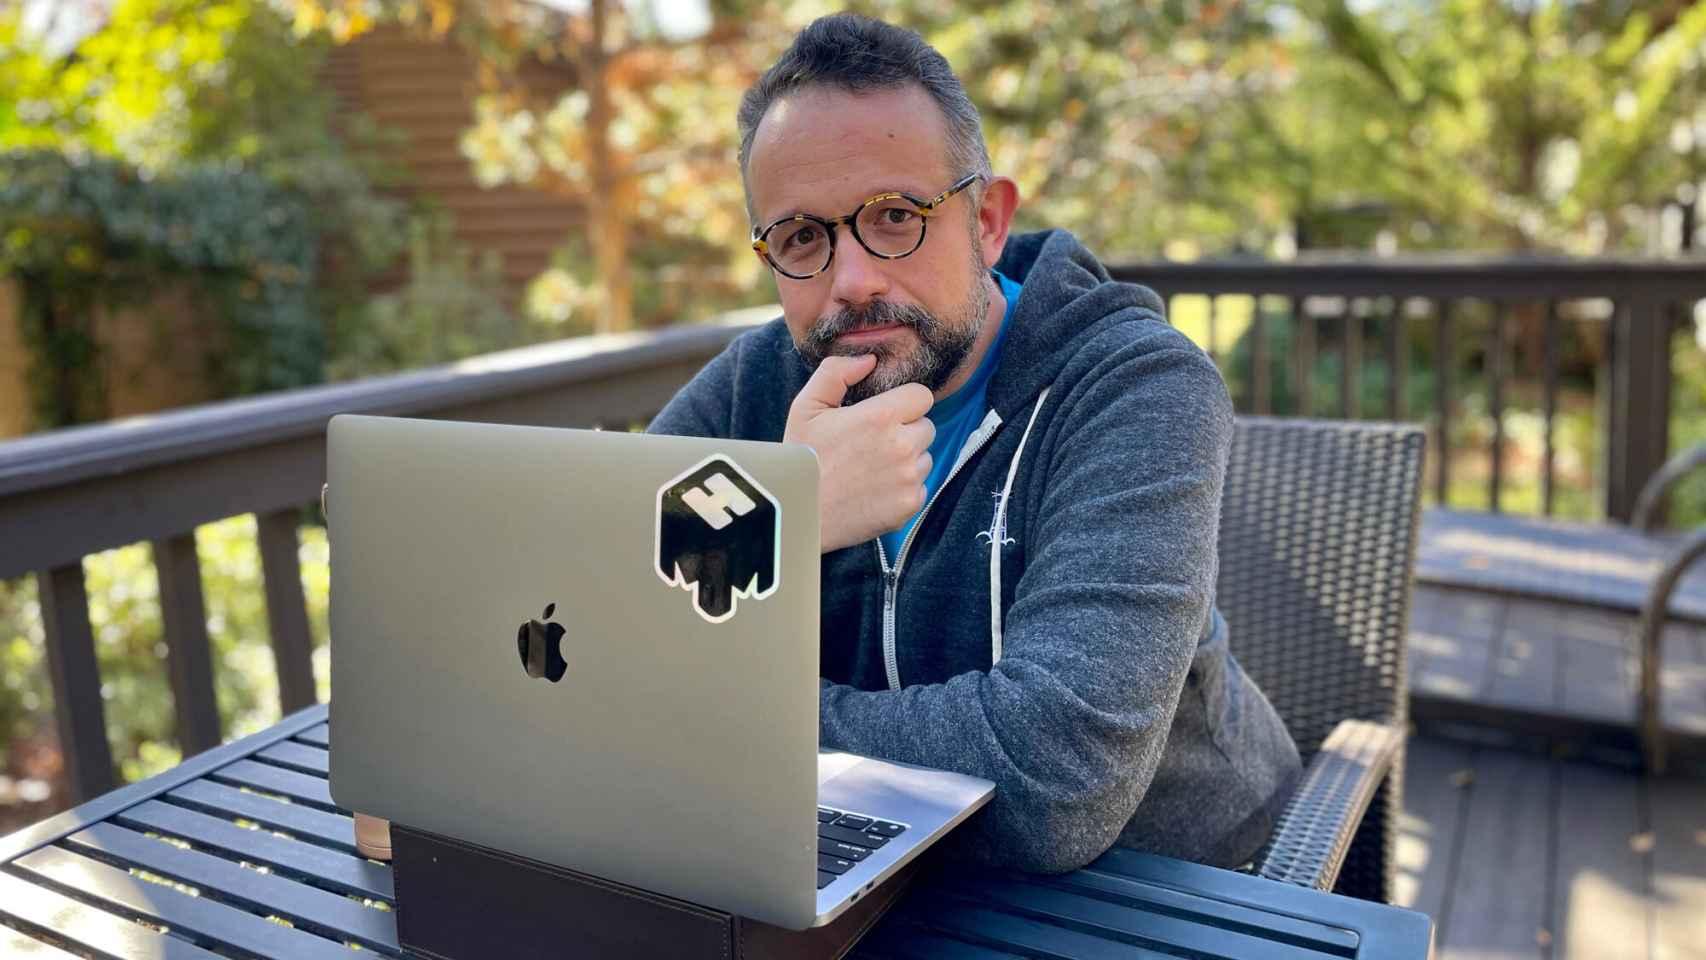 Phil Libin es el creador de la startup mmhmm.